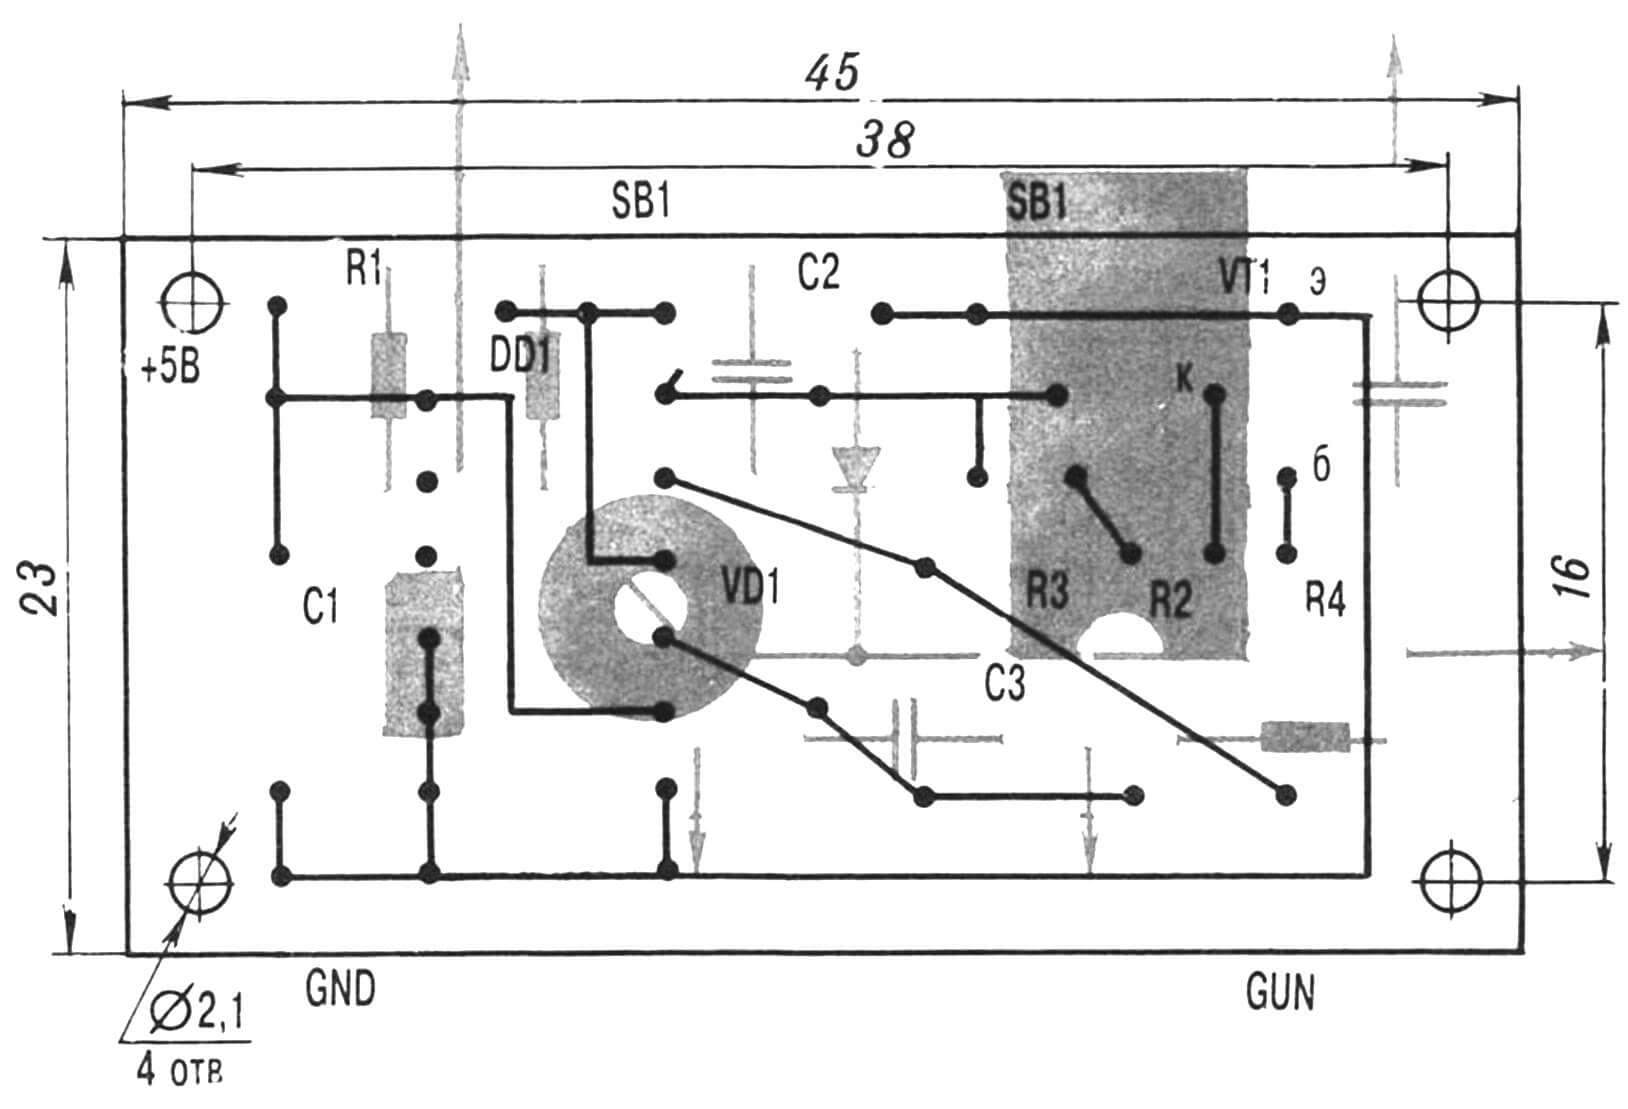 Рис. 6. Печатная плата с элементами монтажа.